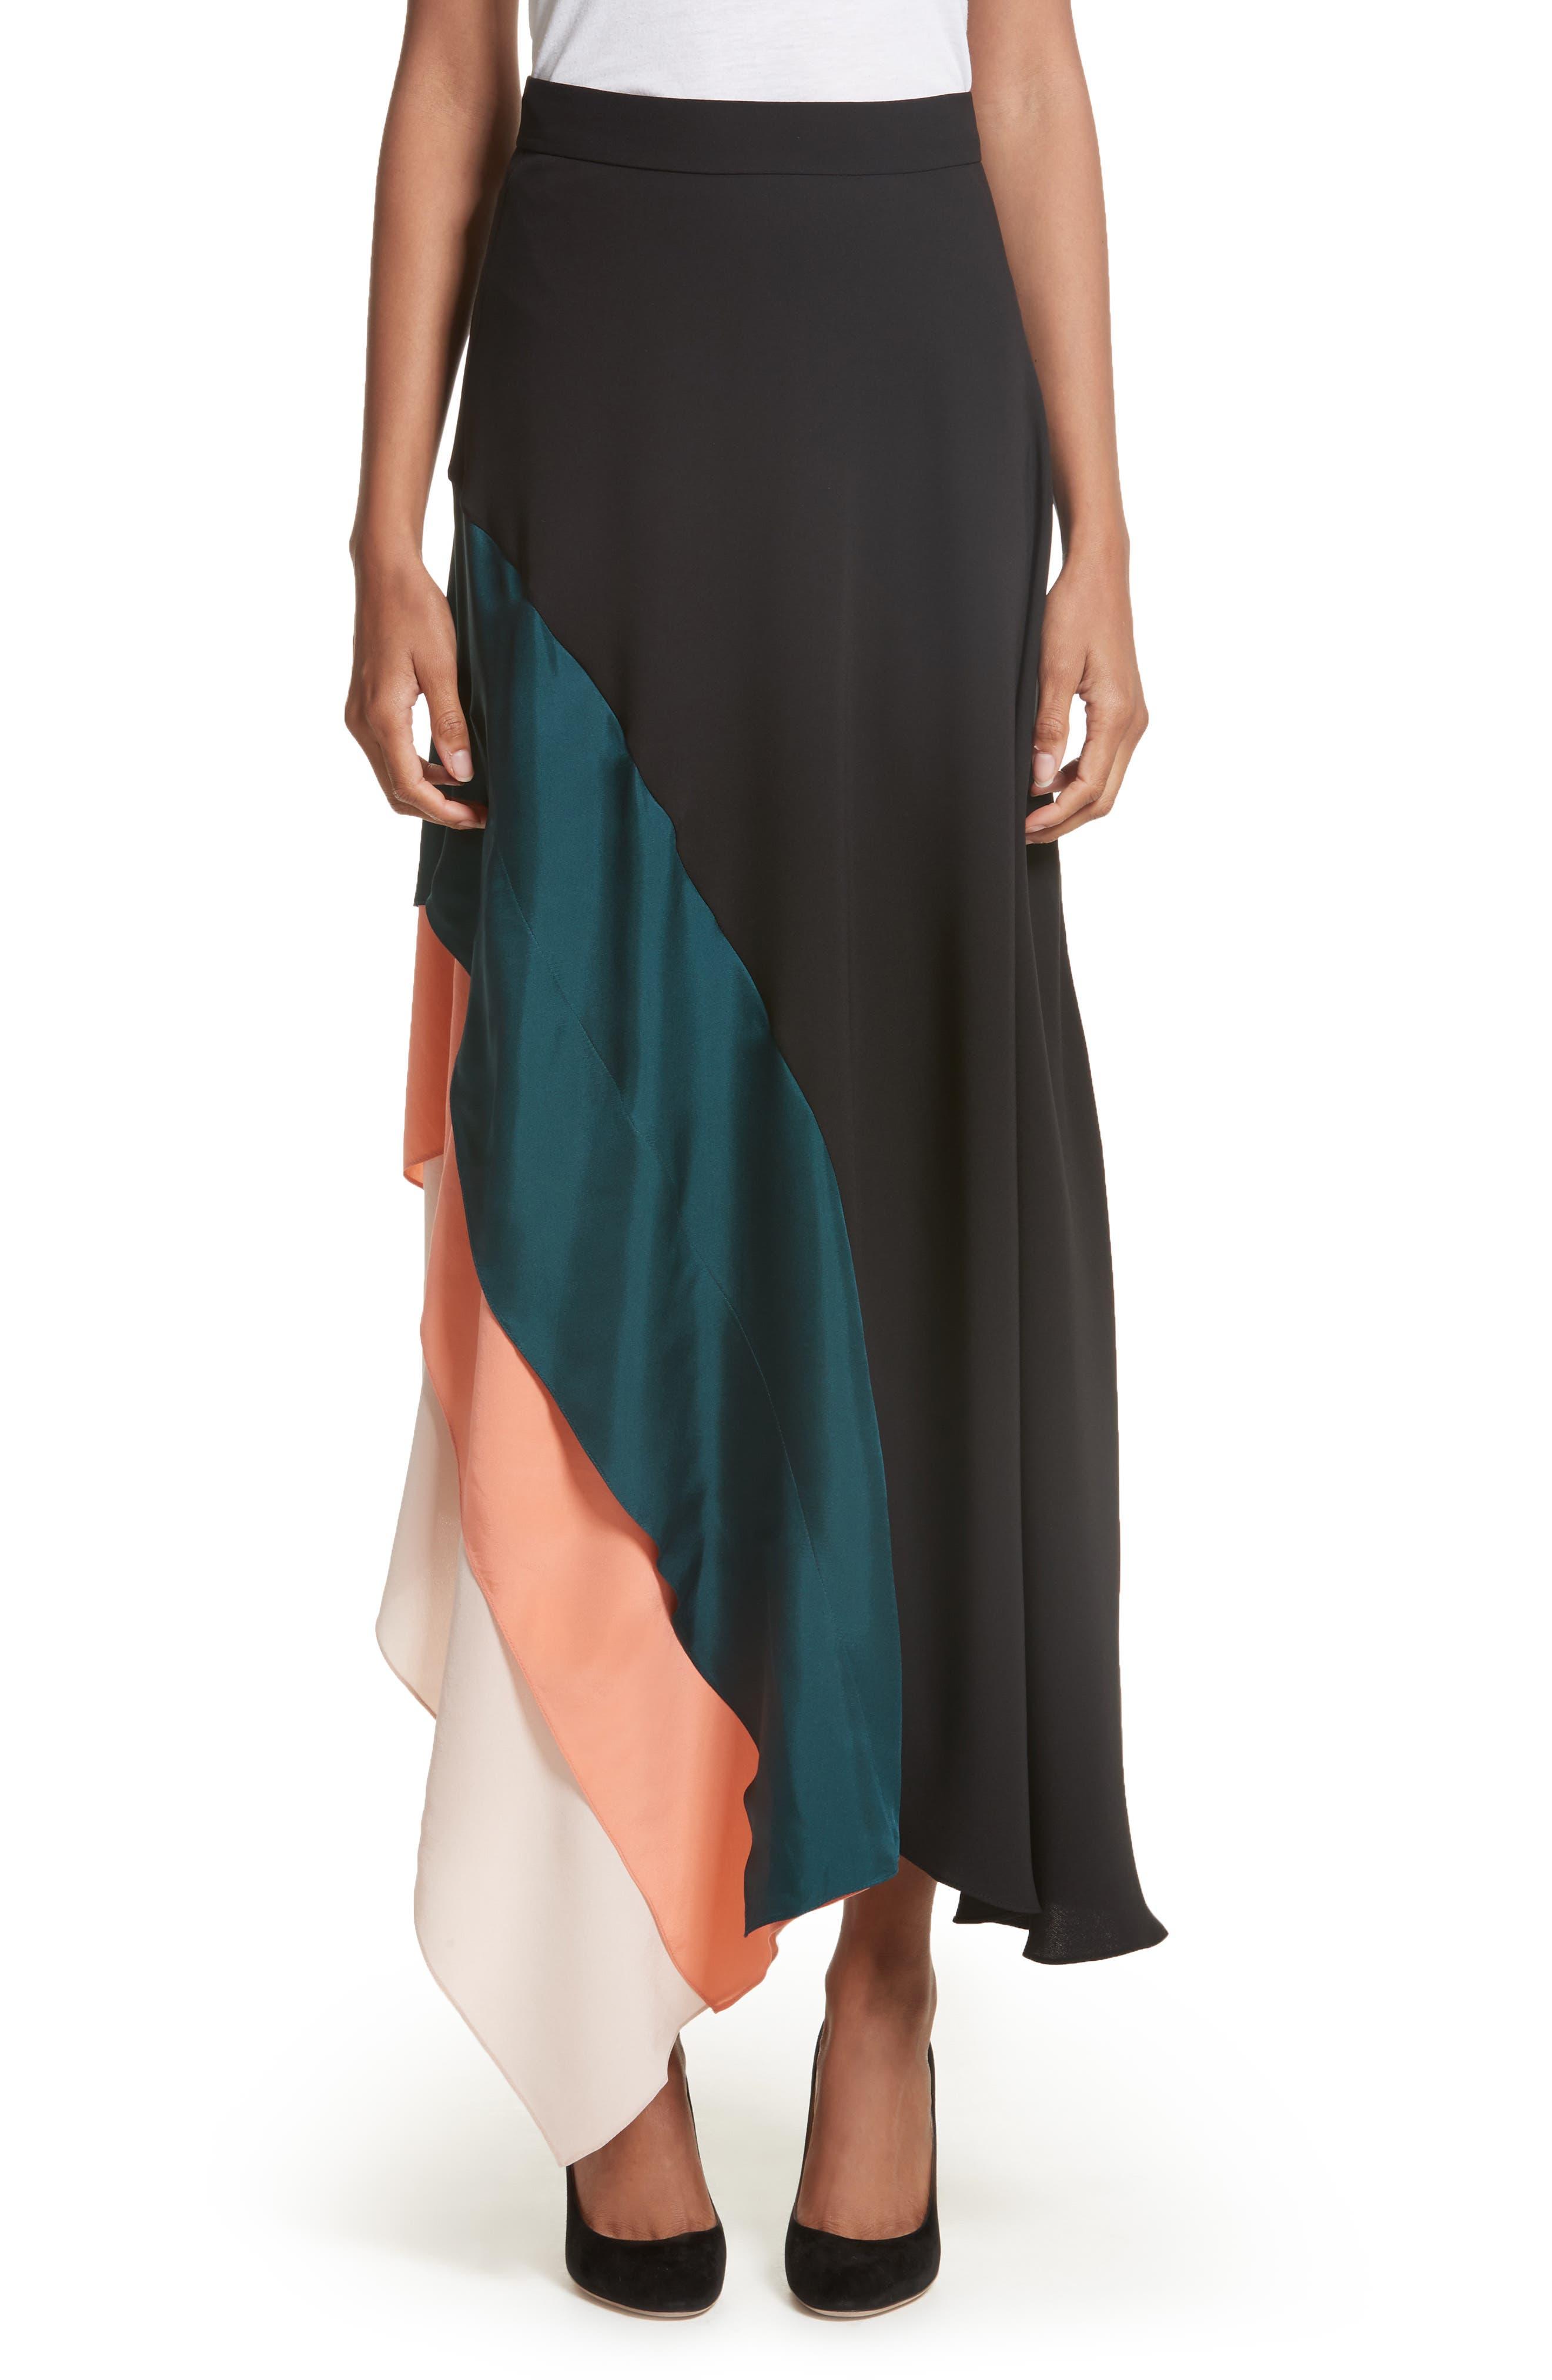 Delma Asymmetric Silk Skirt,                         Main,                         color, Black Peacock/ Apricot Blush